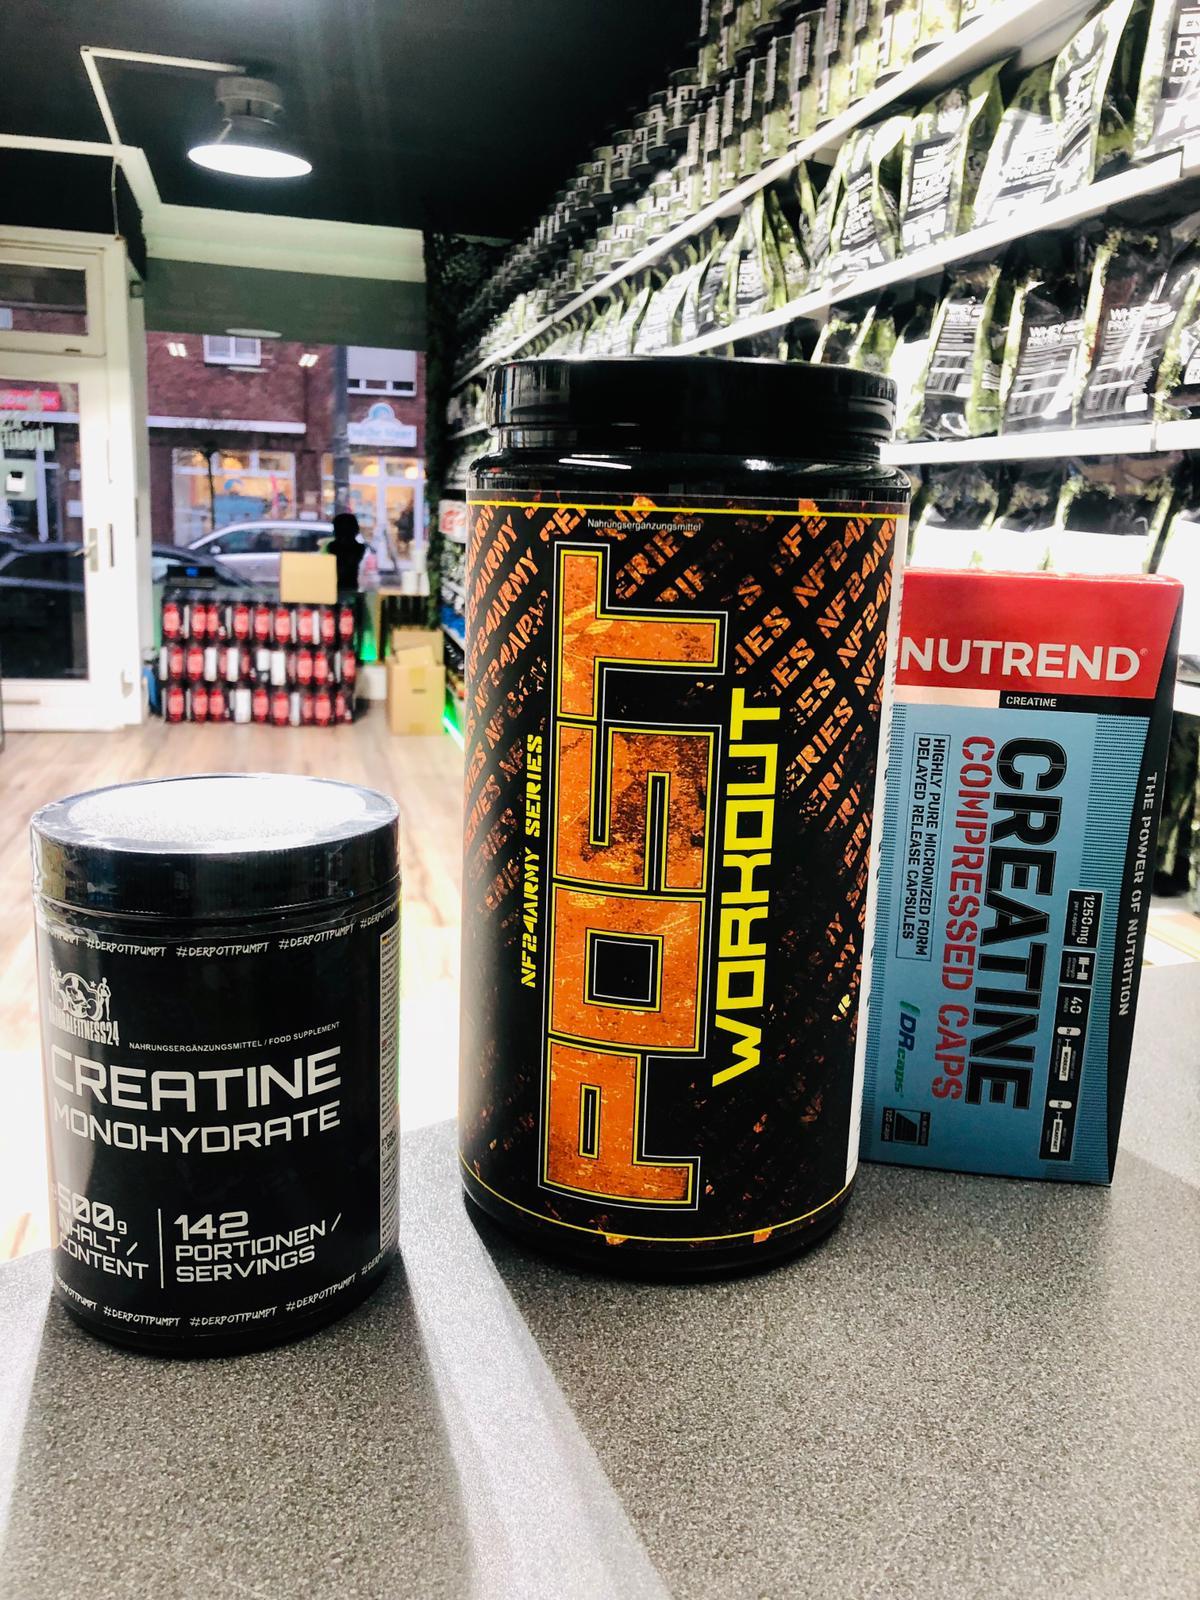 welche supplements